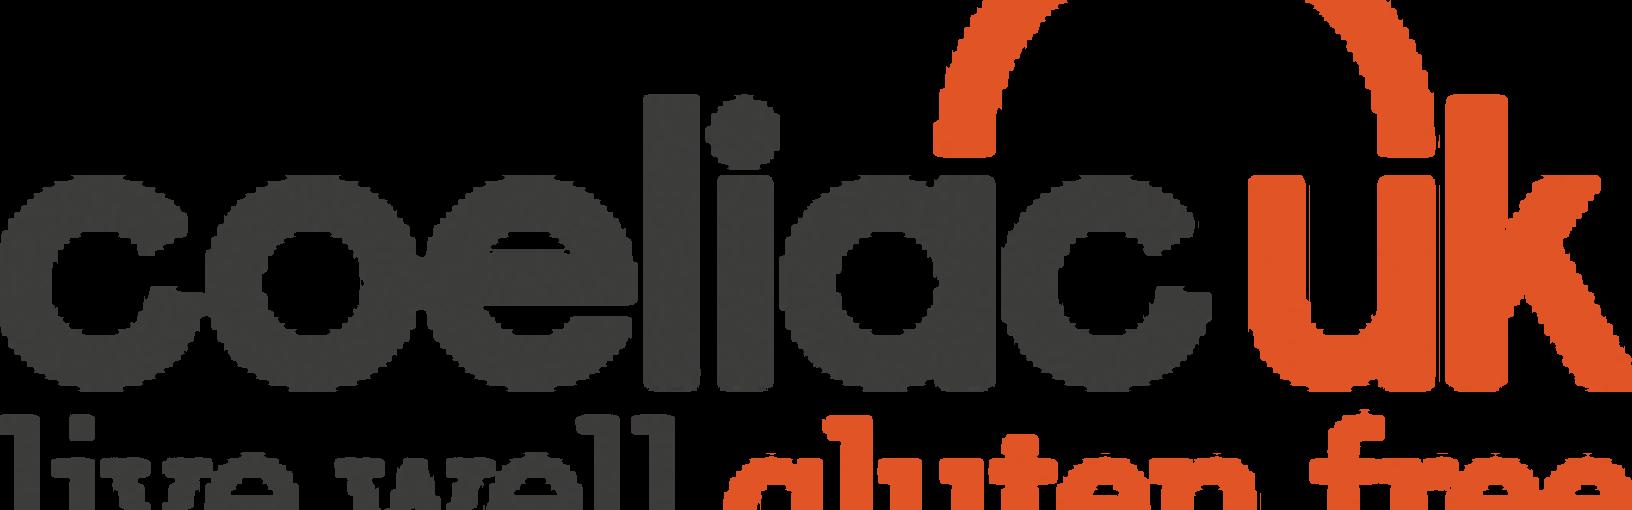 Coeliac logo fill 1632x510